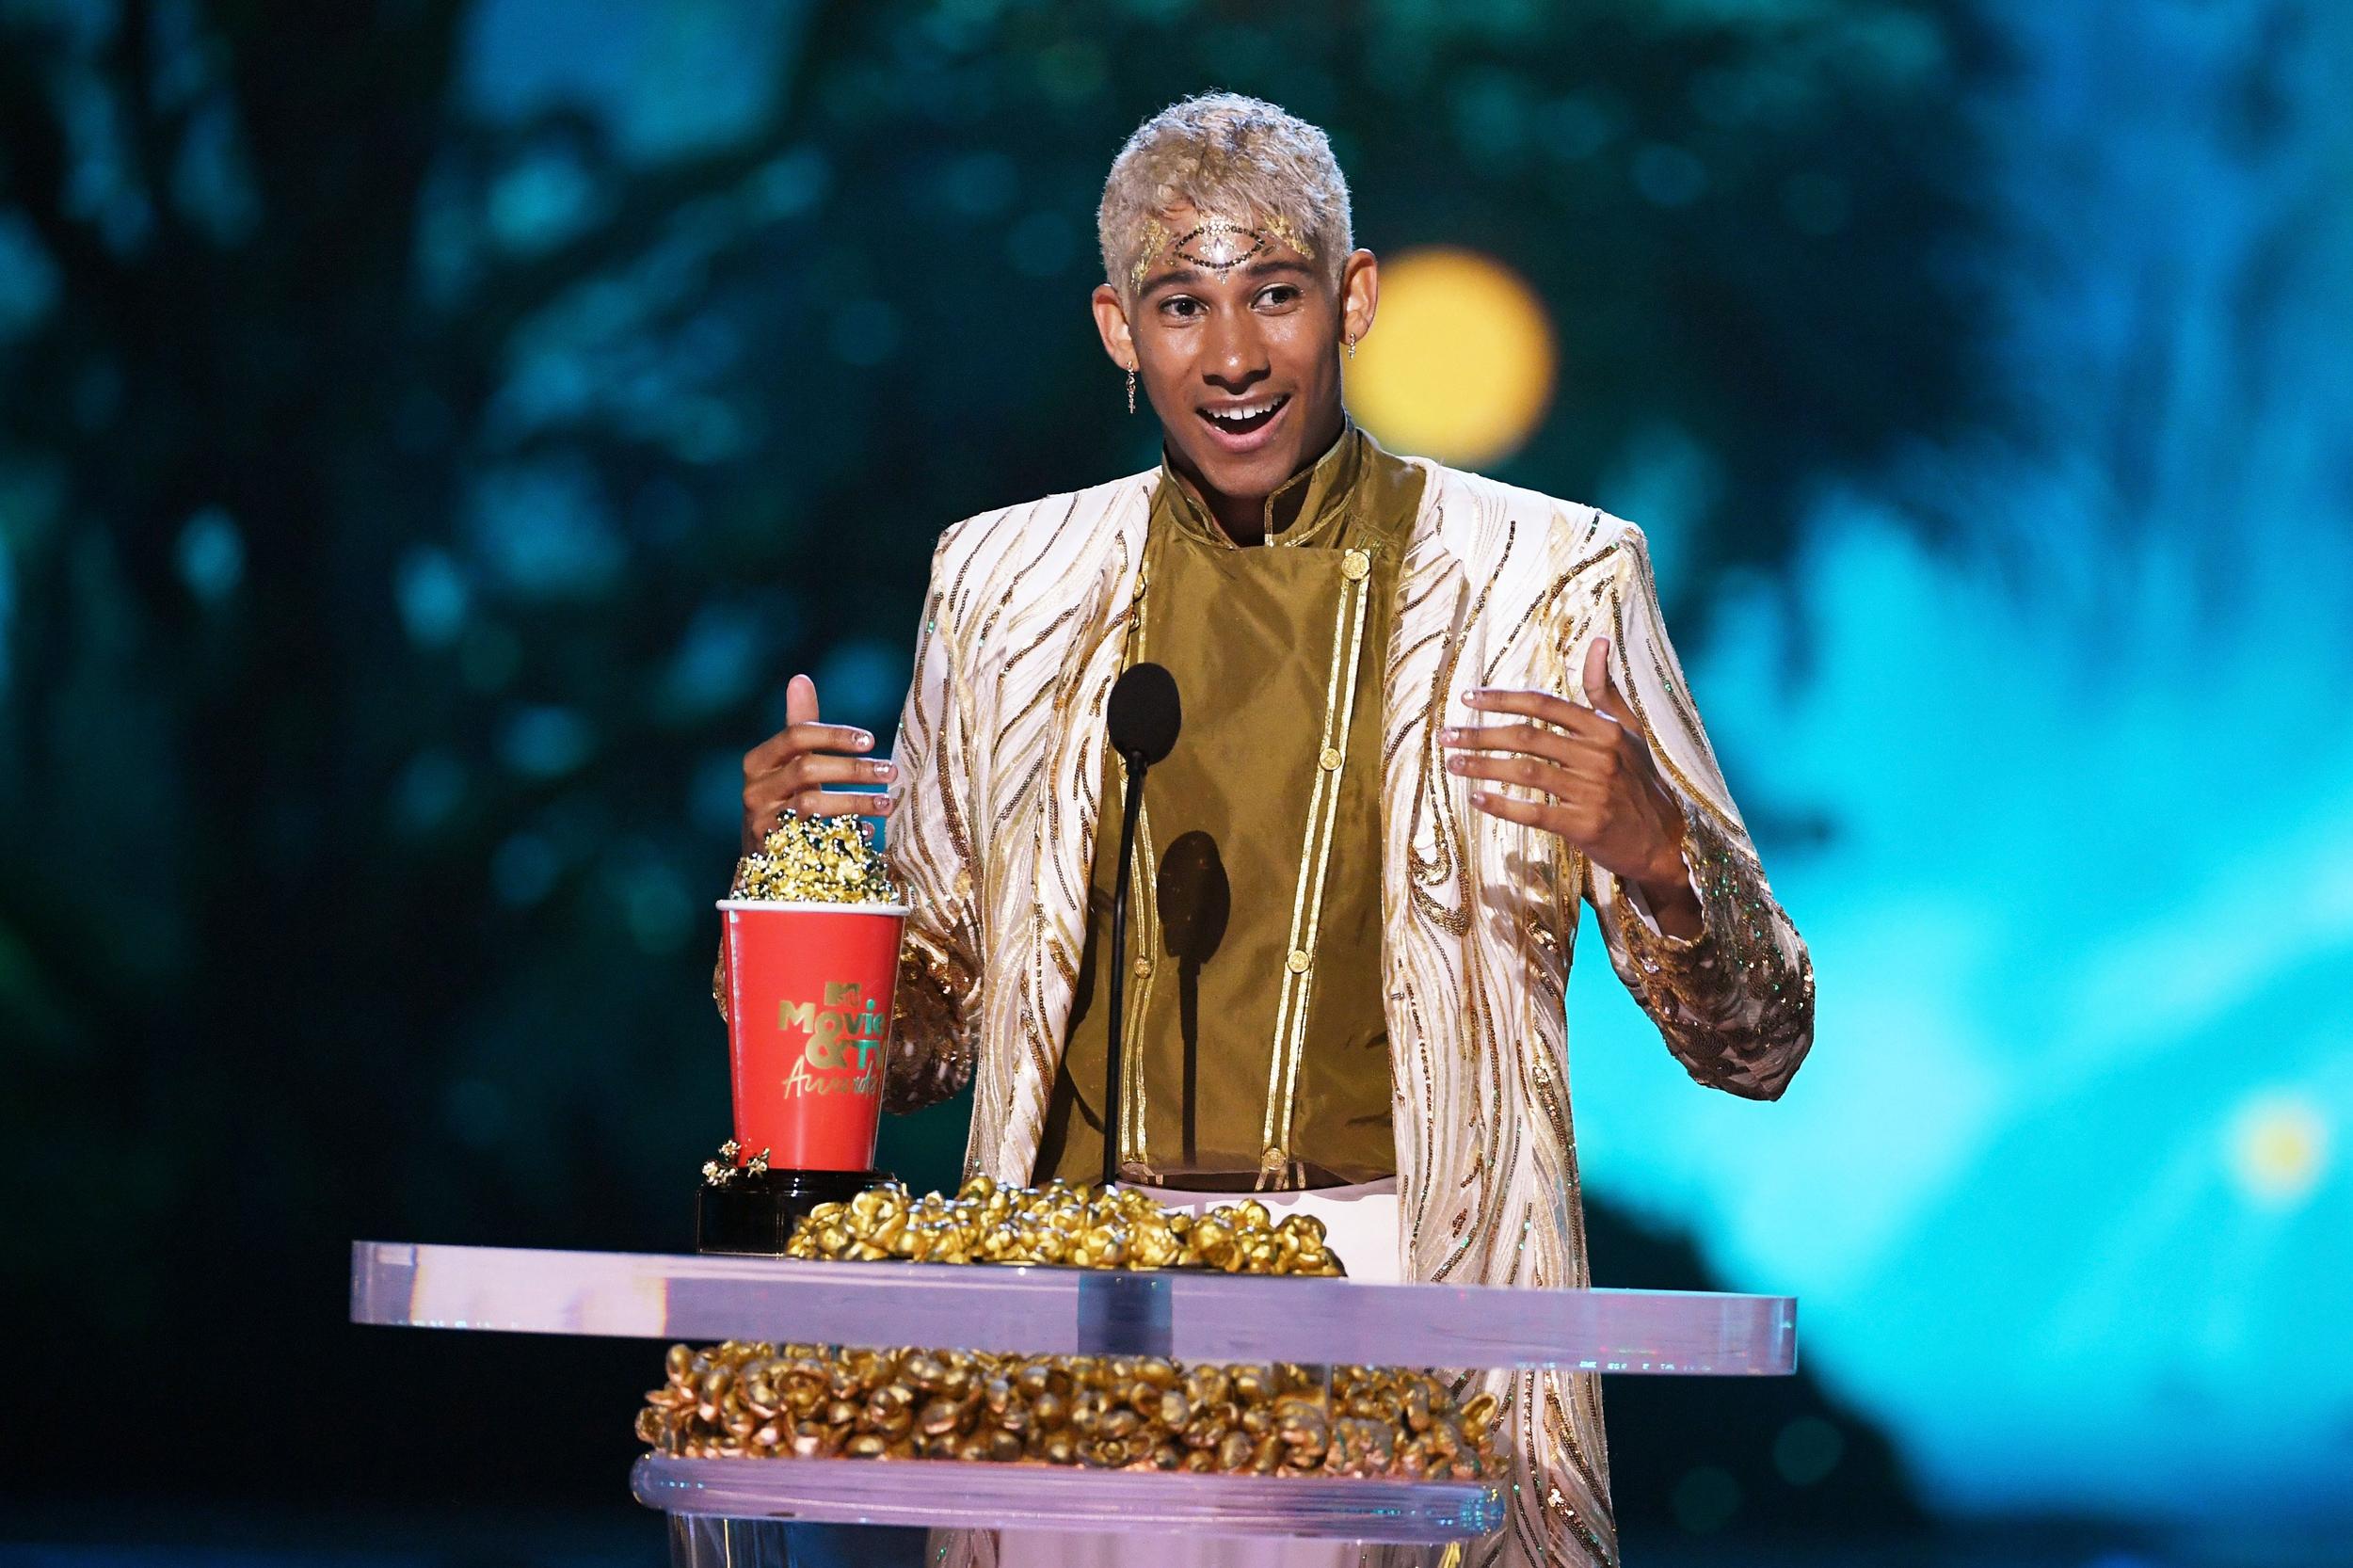 Gay teen romance 'Love, Simon' wins MTV's Best Kiss award